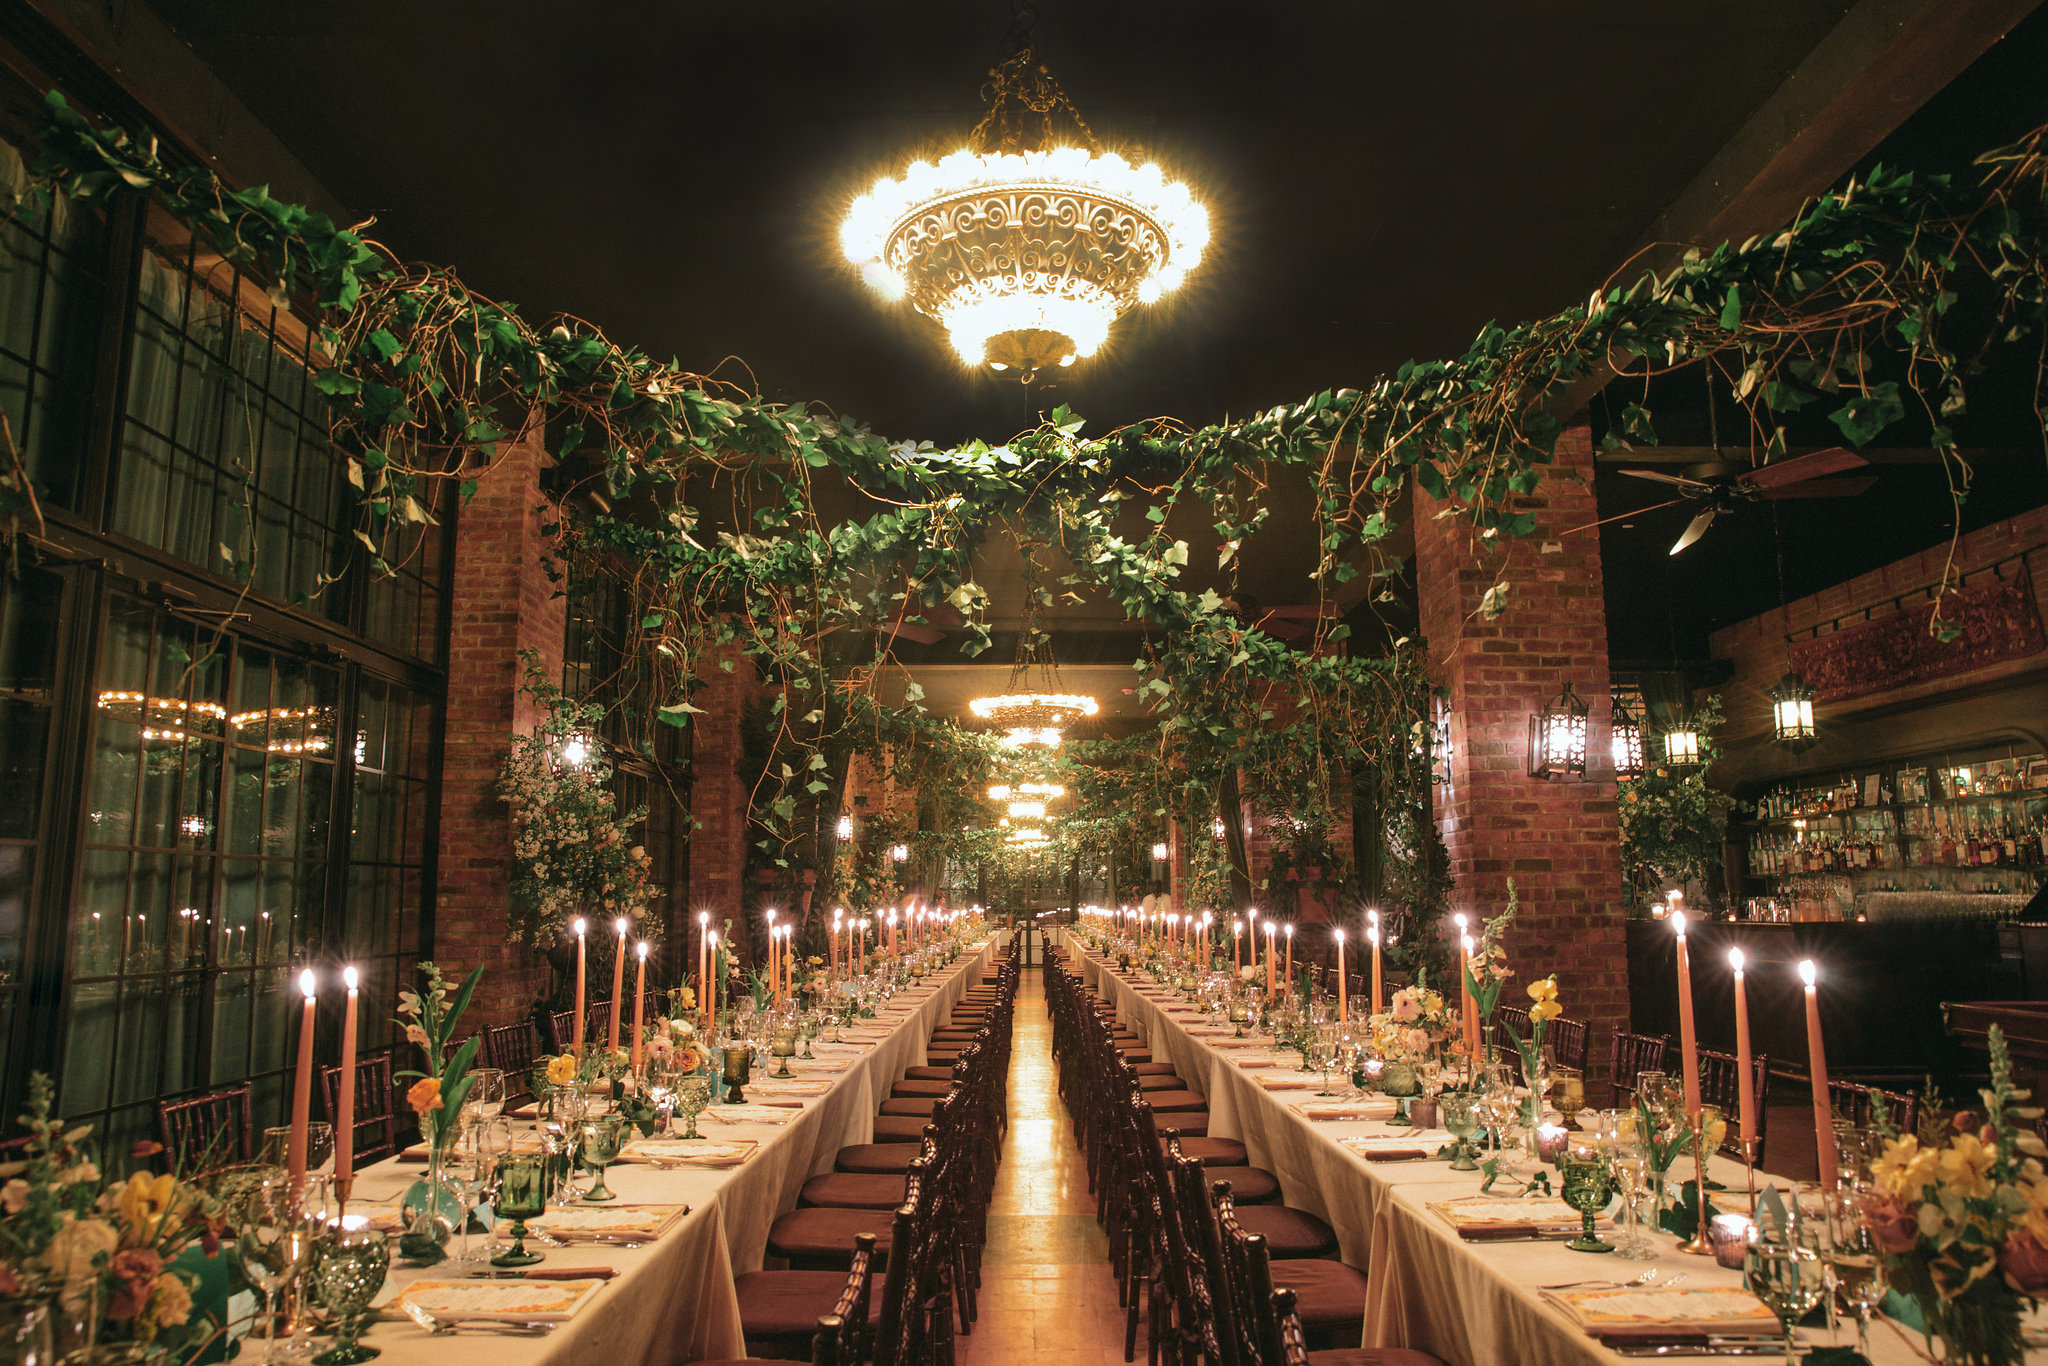 bowery-hotel-wedding-jove-meyer-events-044.jpg